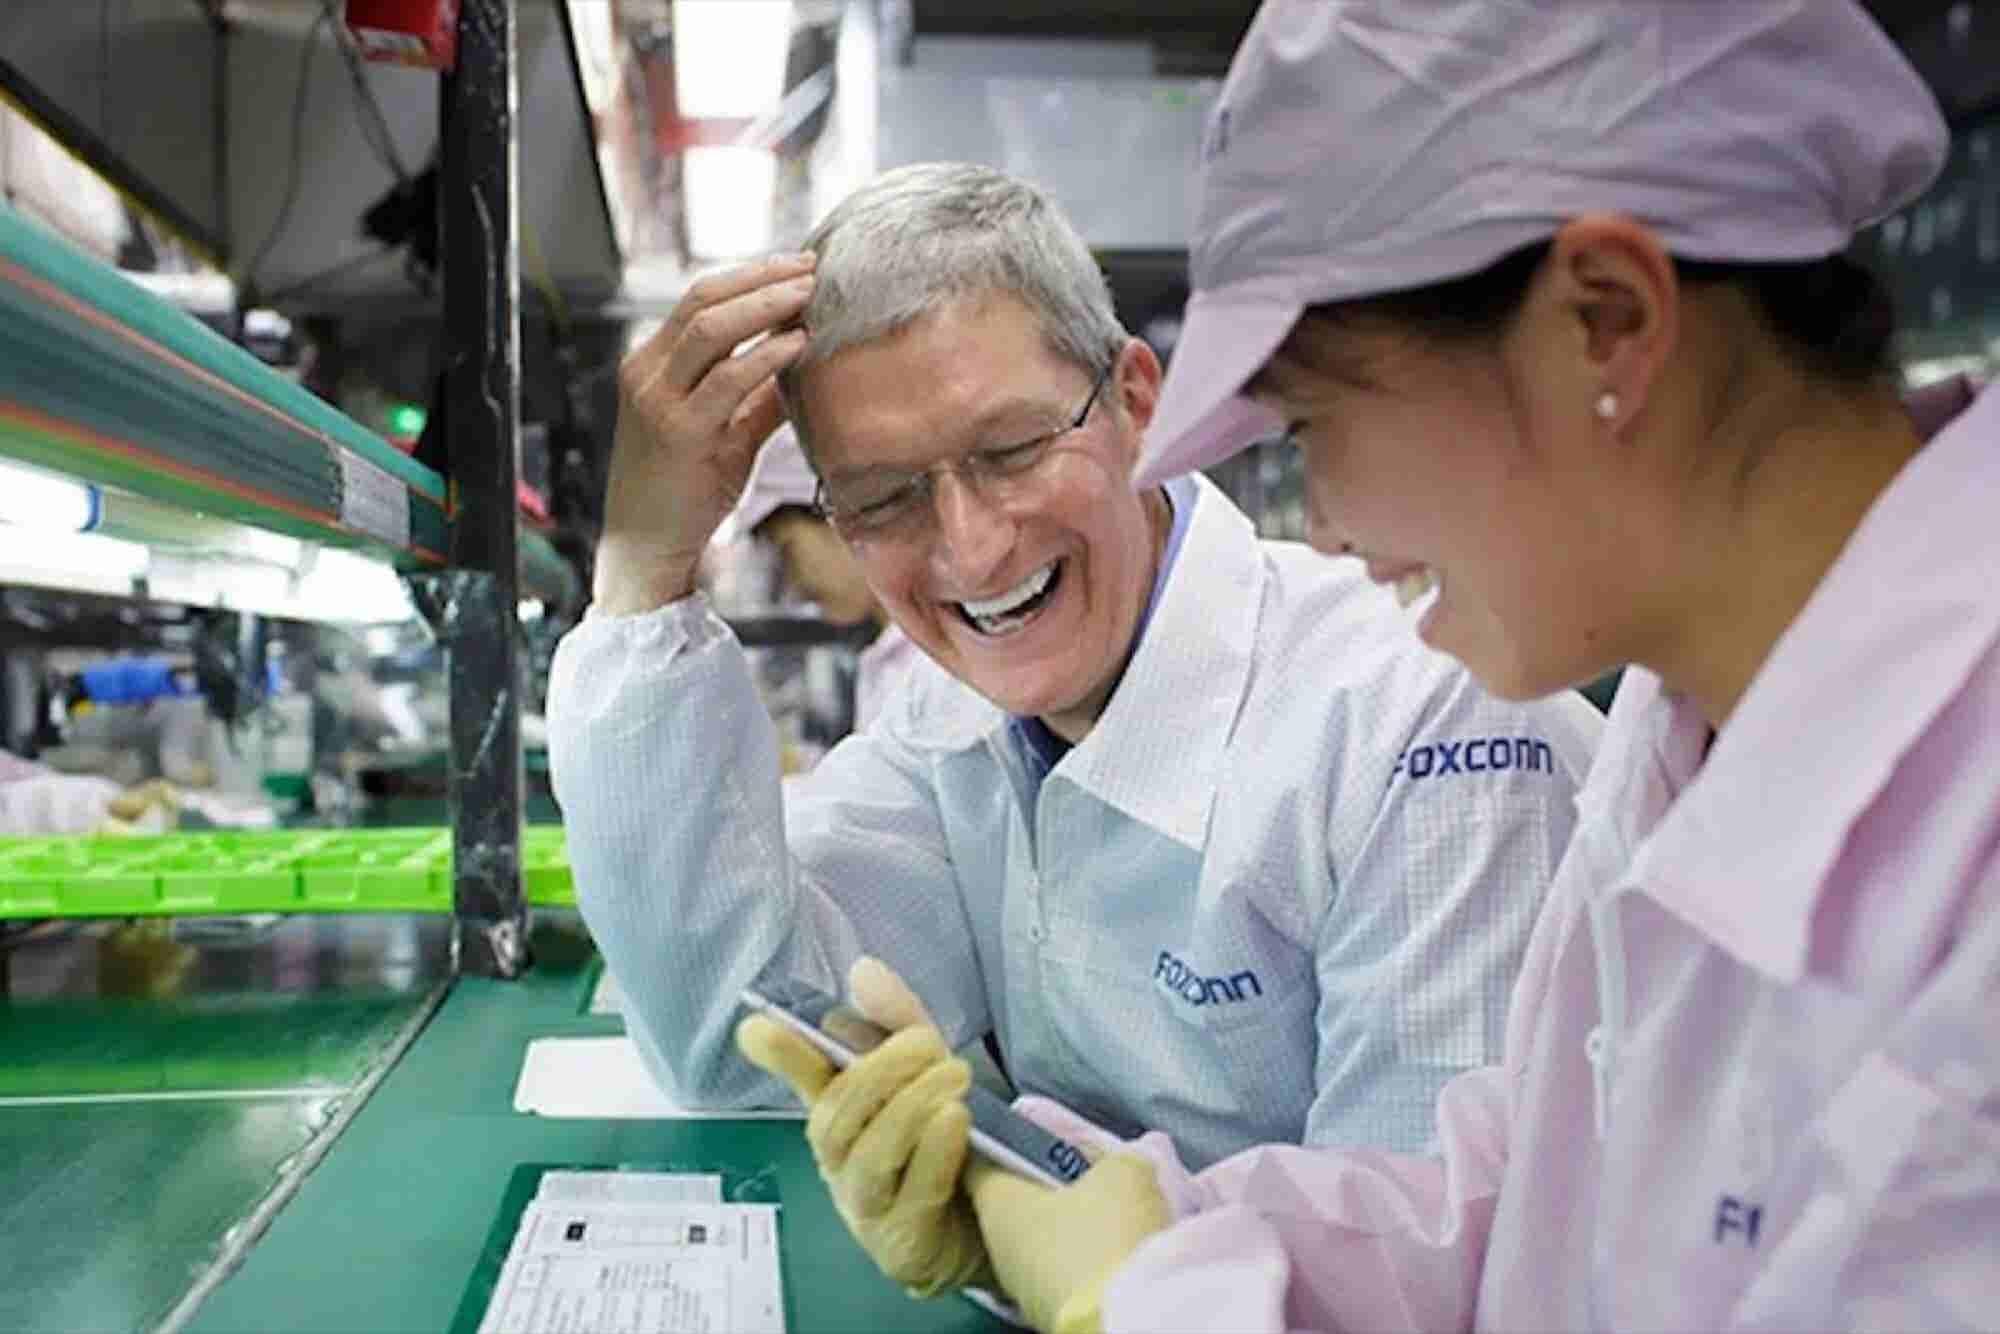 Trump: Apple to Build '3 Big Plants' in U.S.